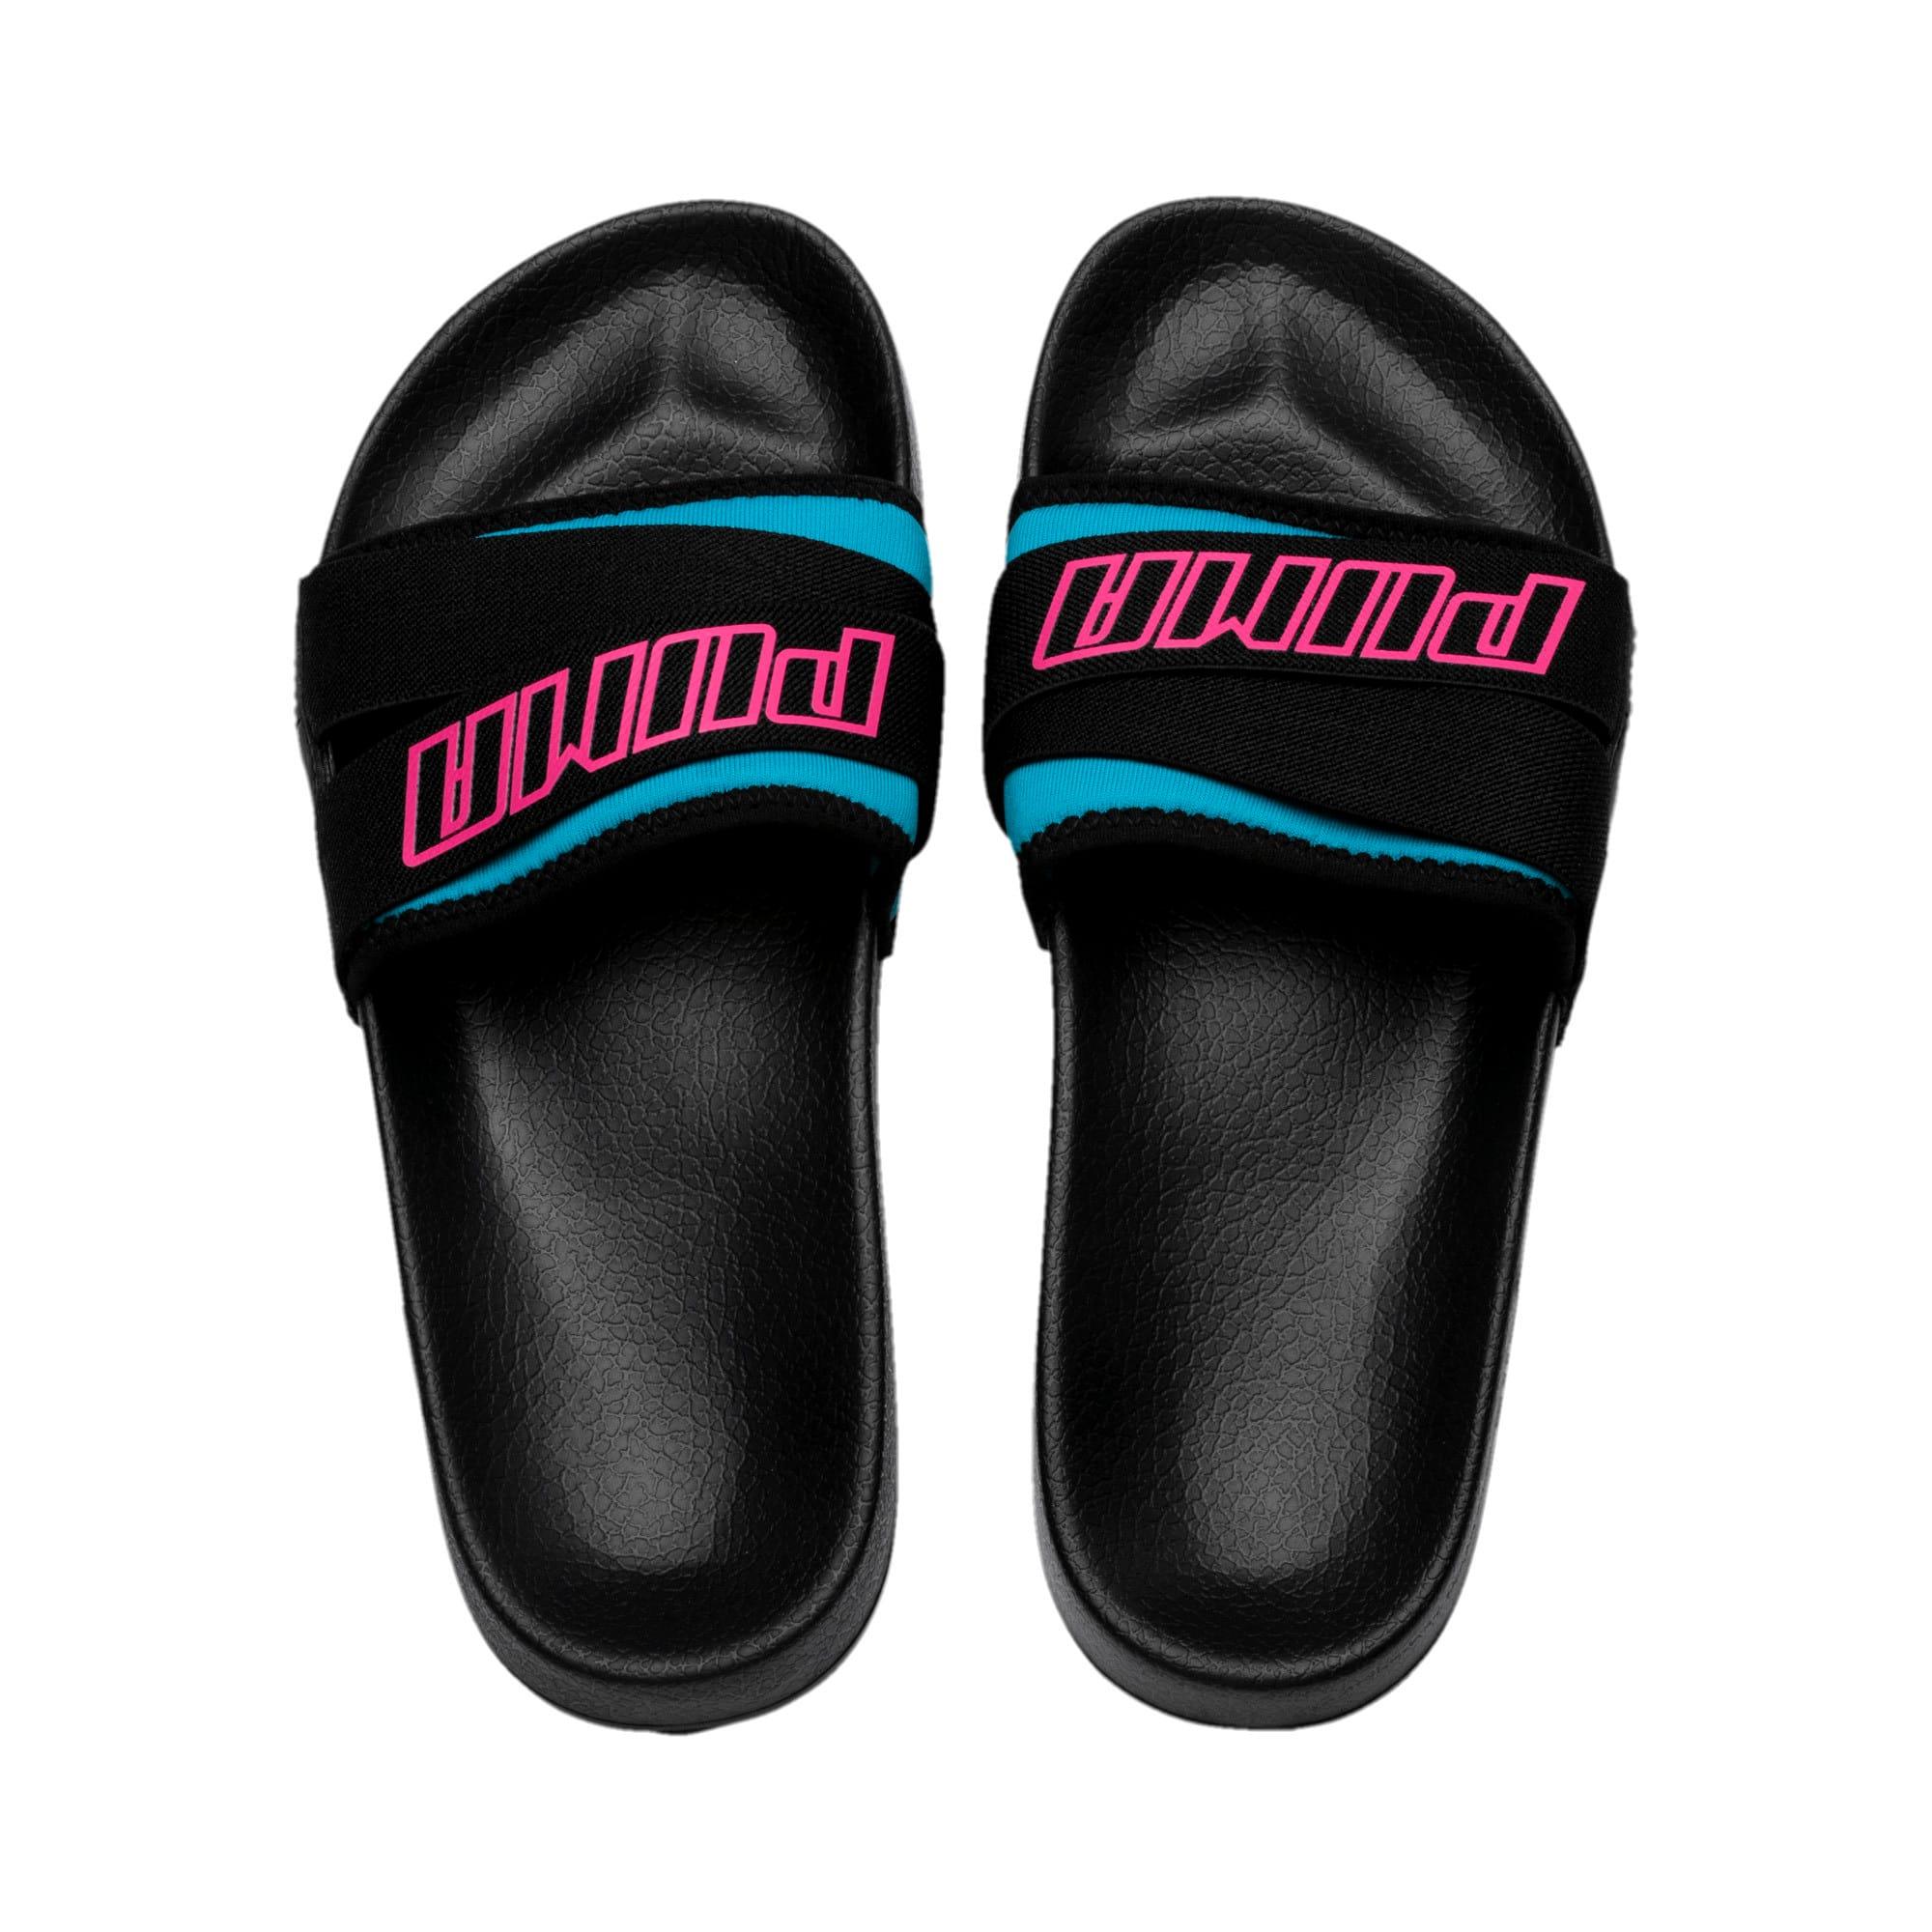 Thumbnail 6 of Leadcat Trailblazer Slide Women's Sandals, Puma Black-Fuchsia Purple, medium